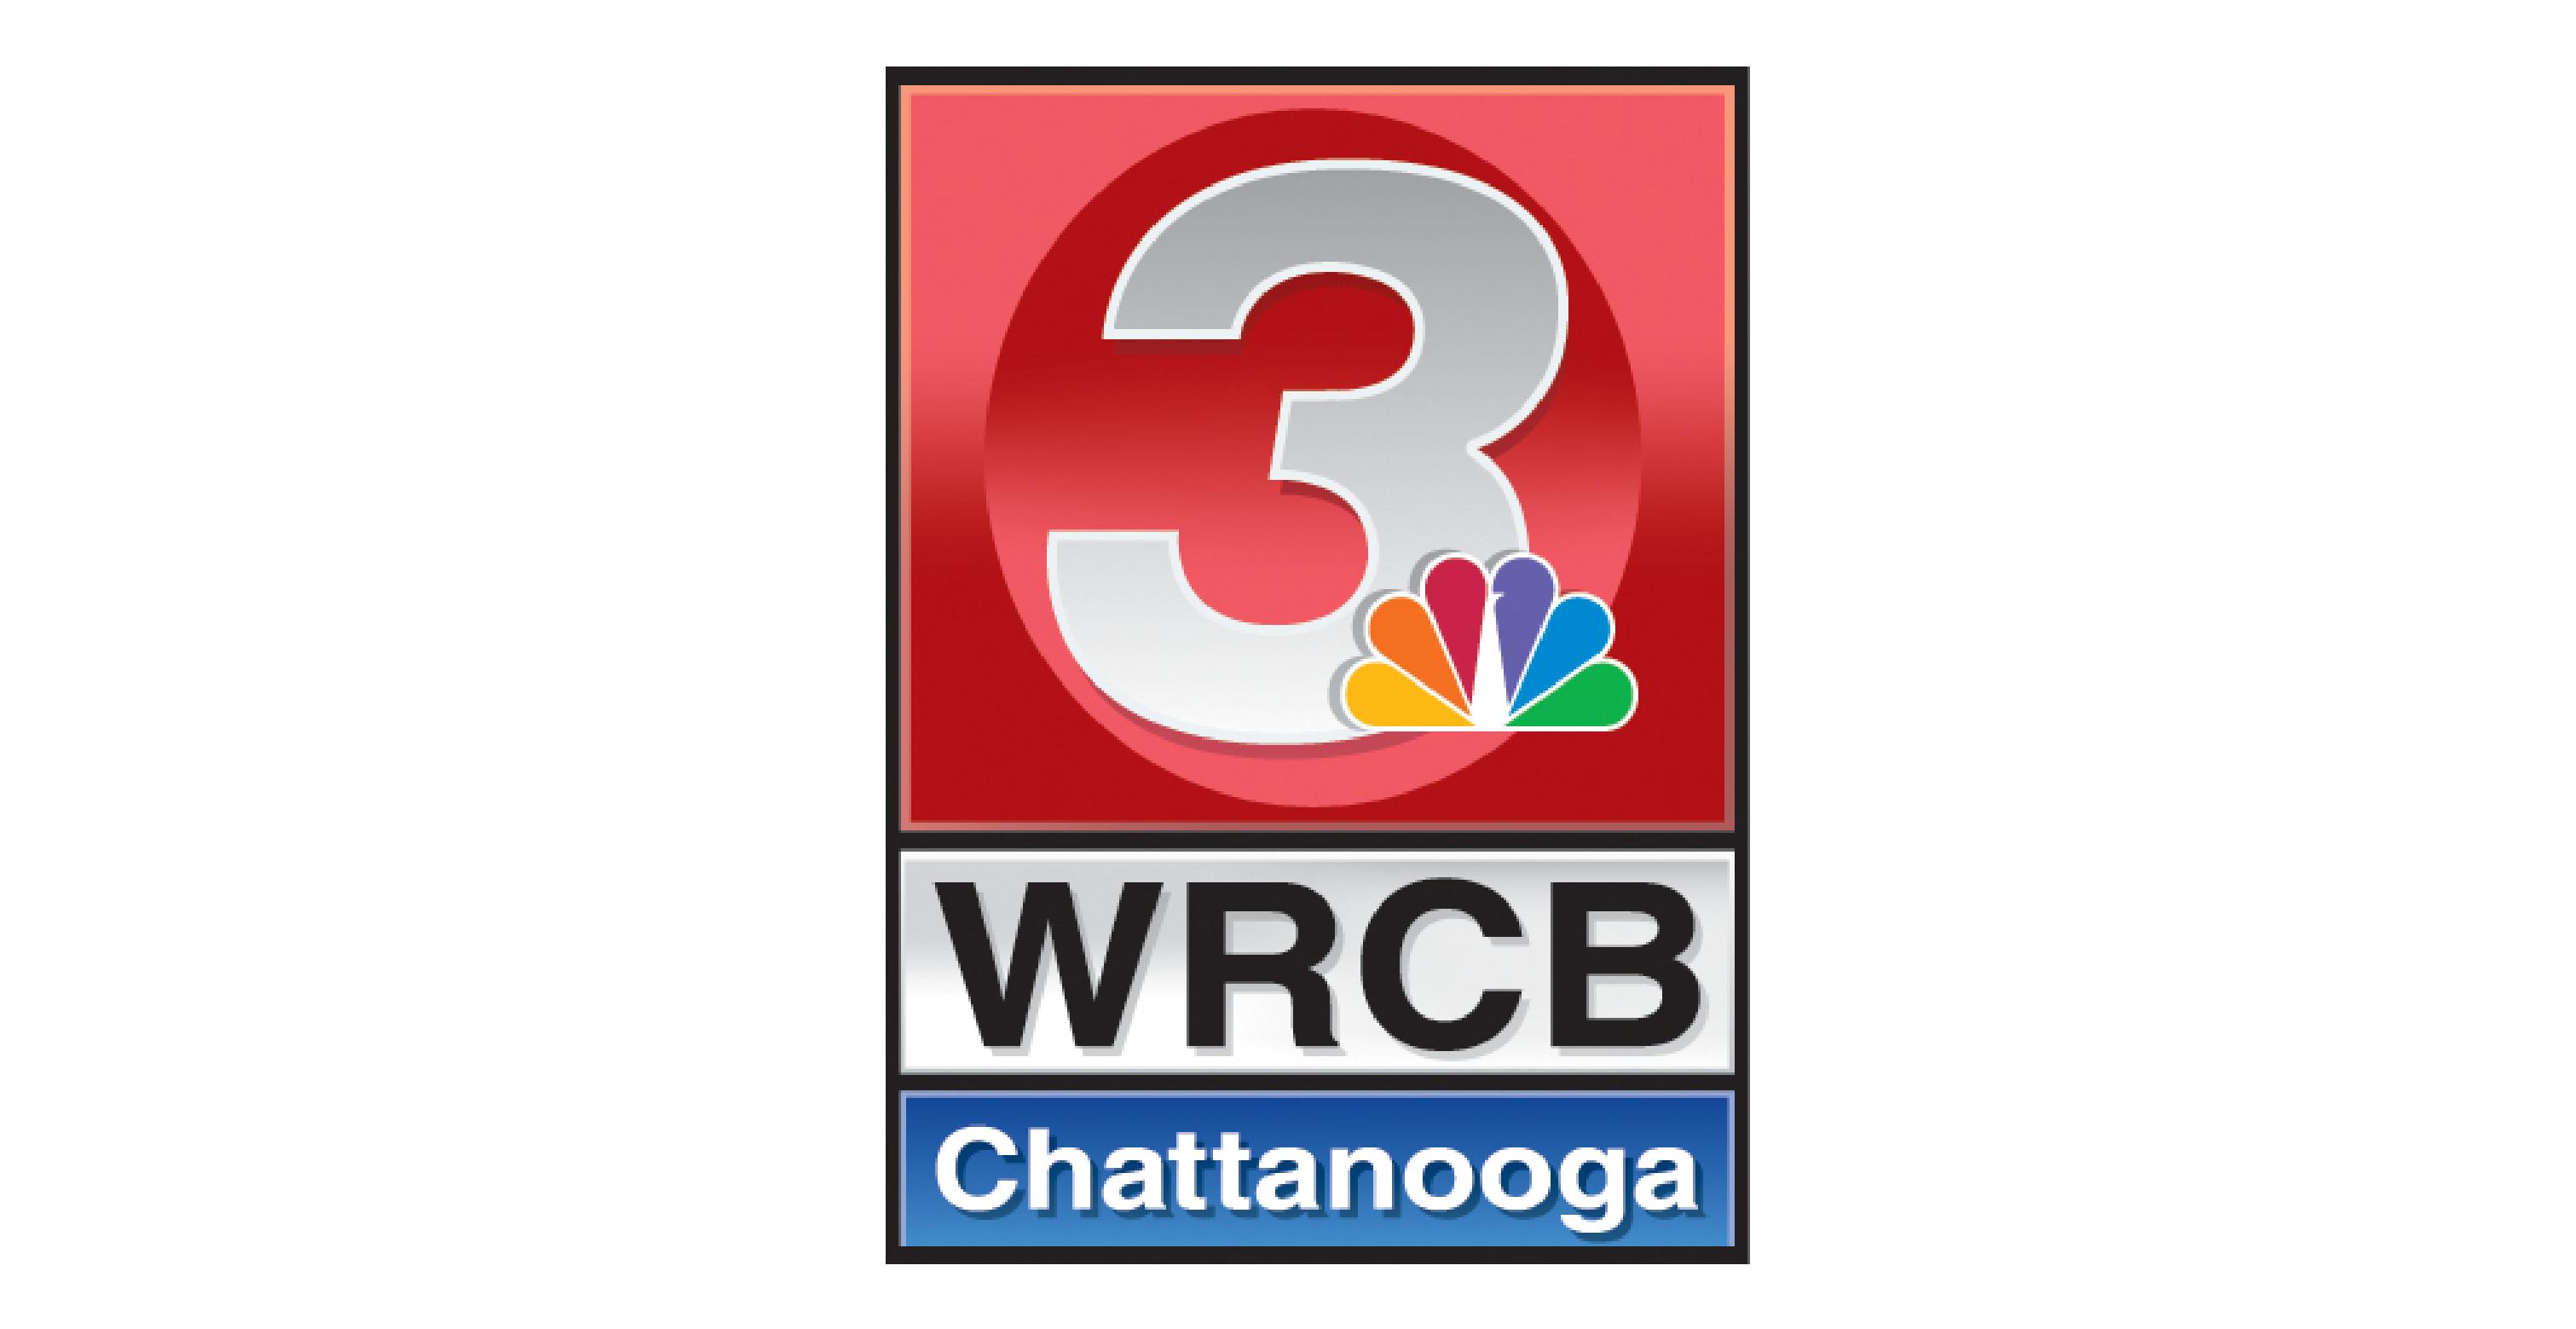 WRCB 3 Chattanooga